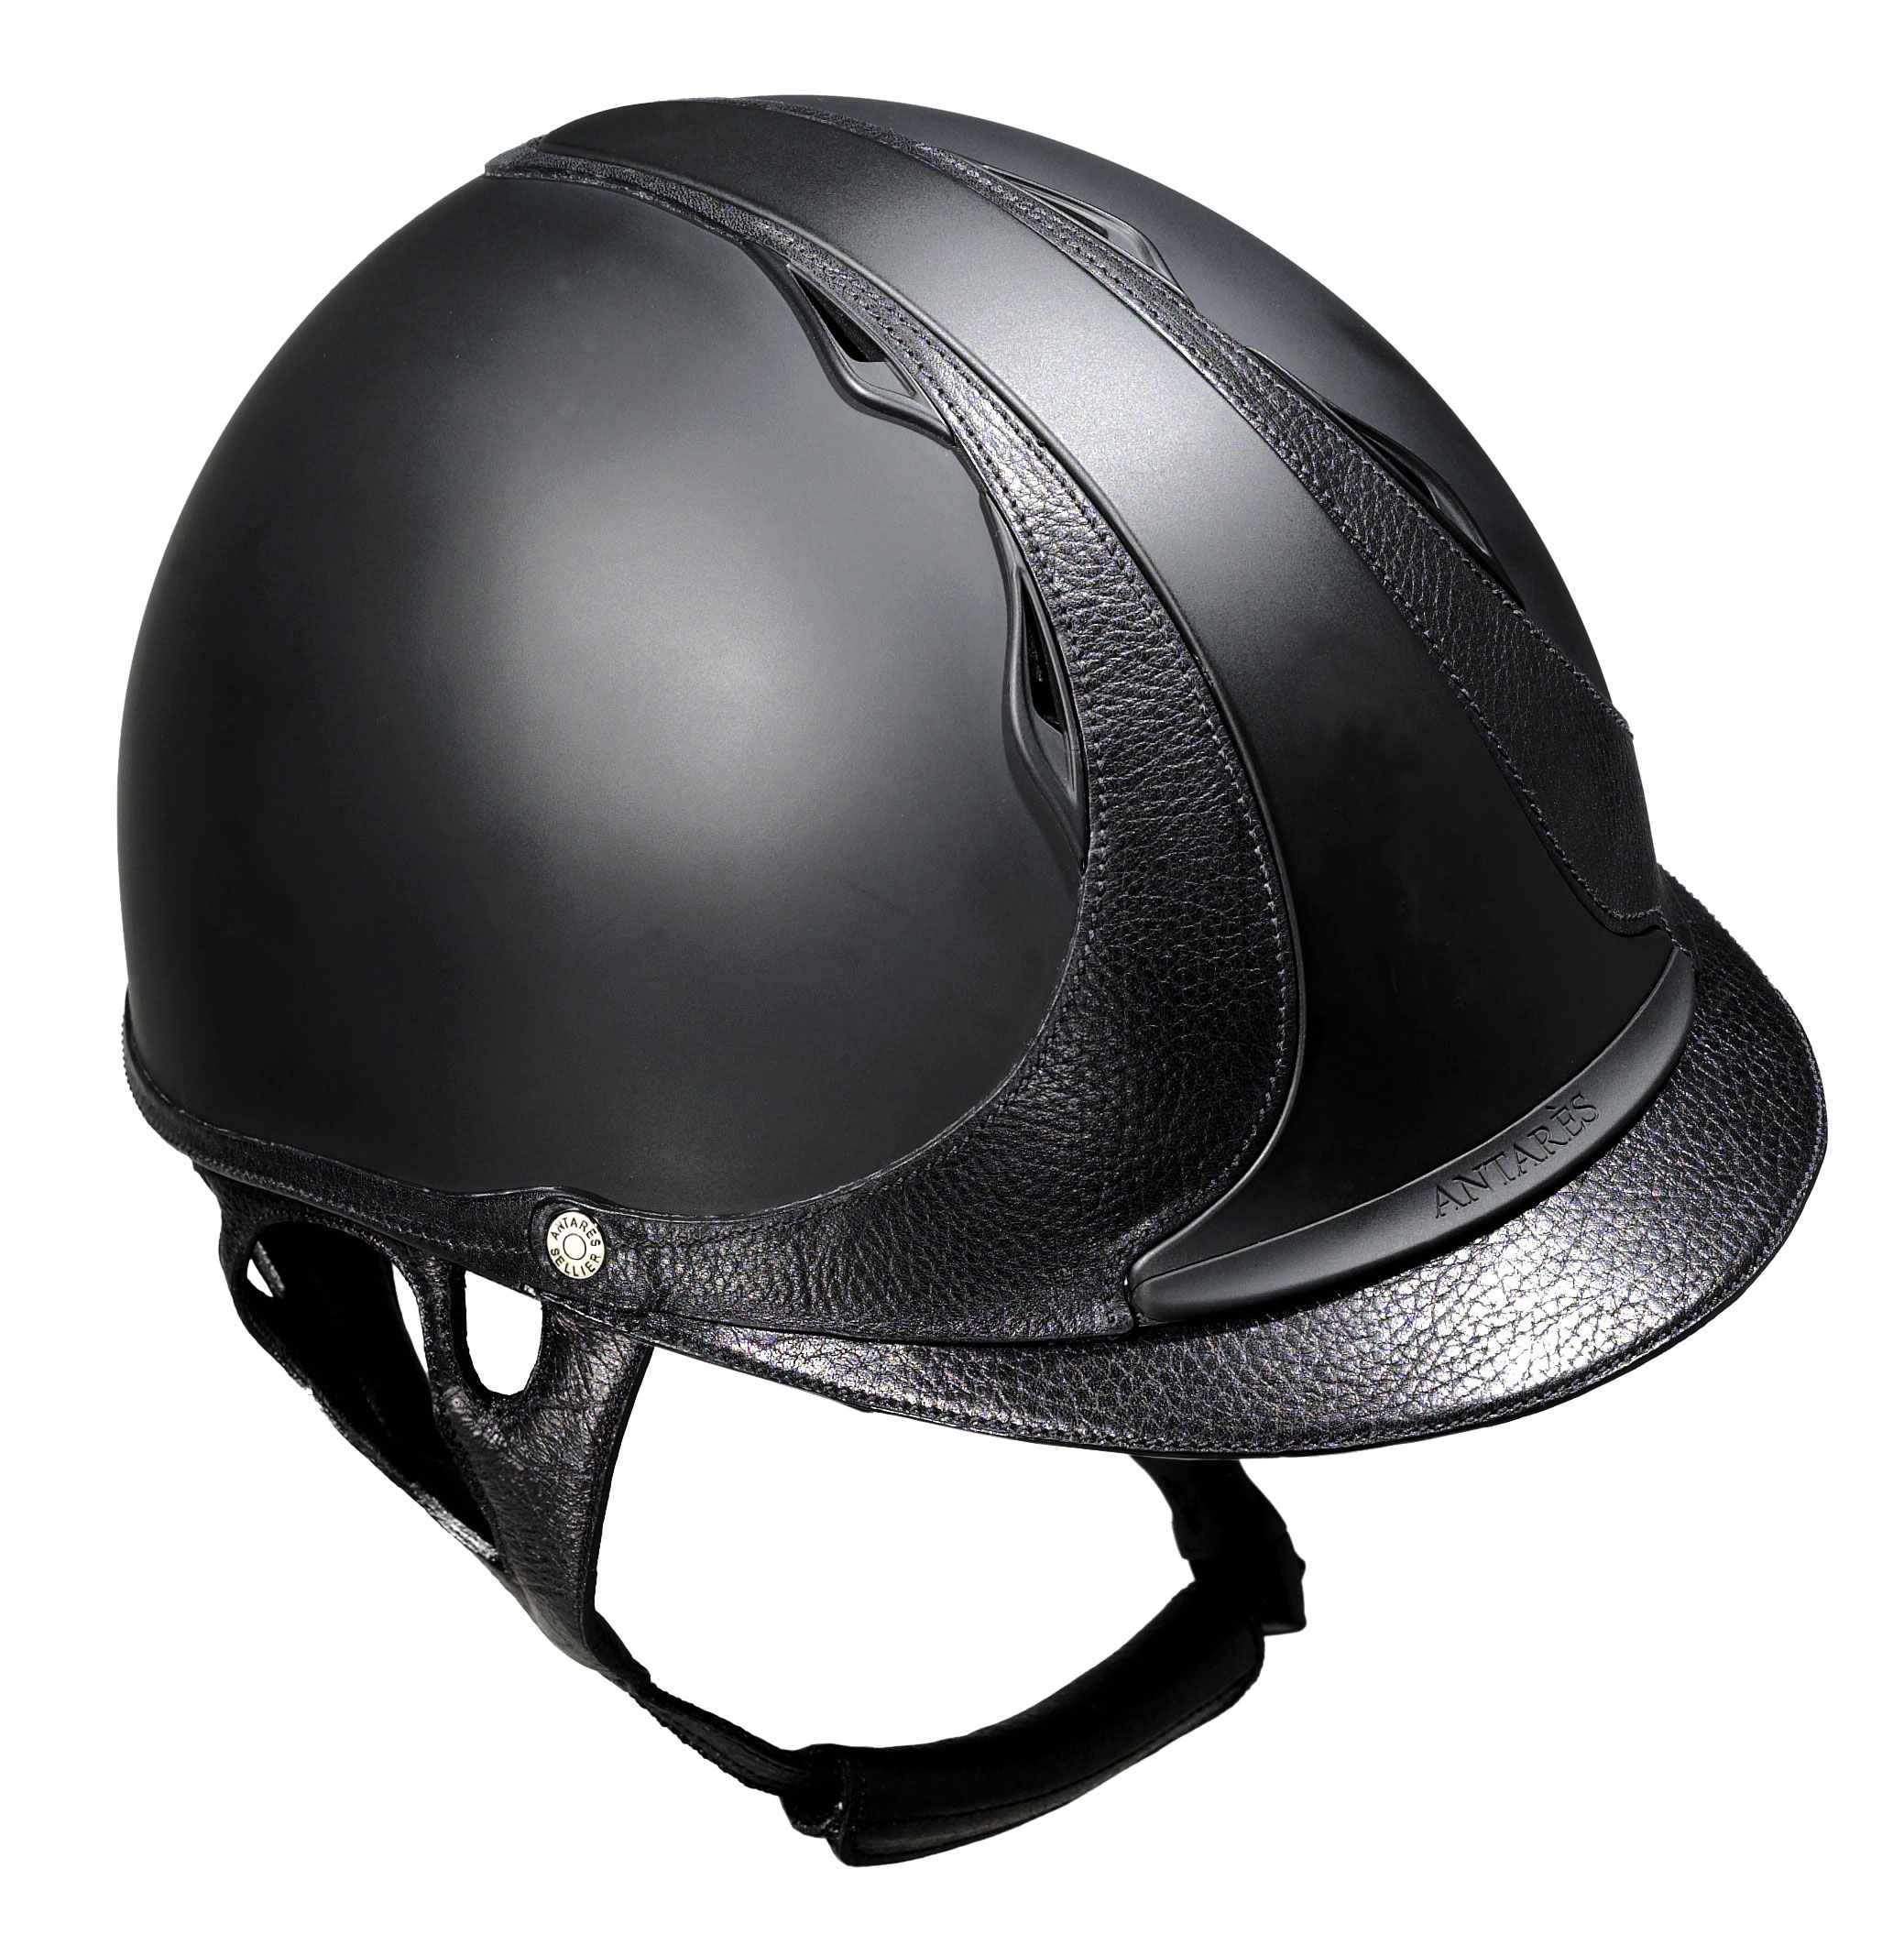 Antares Helmet